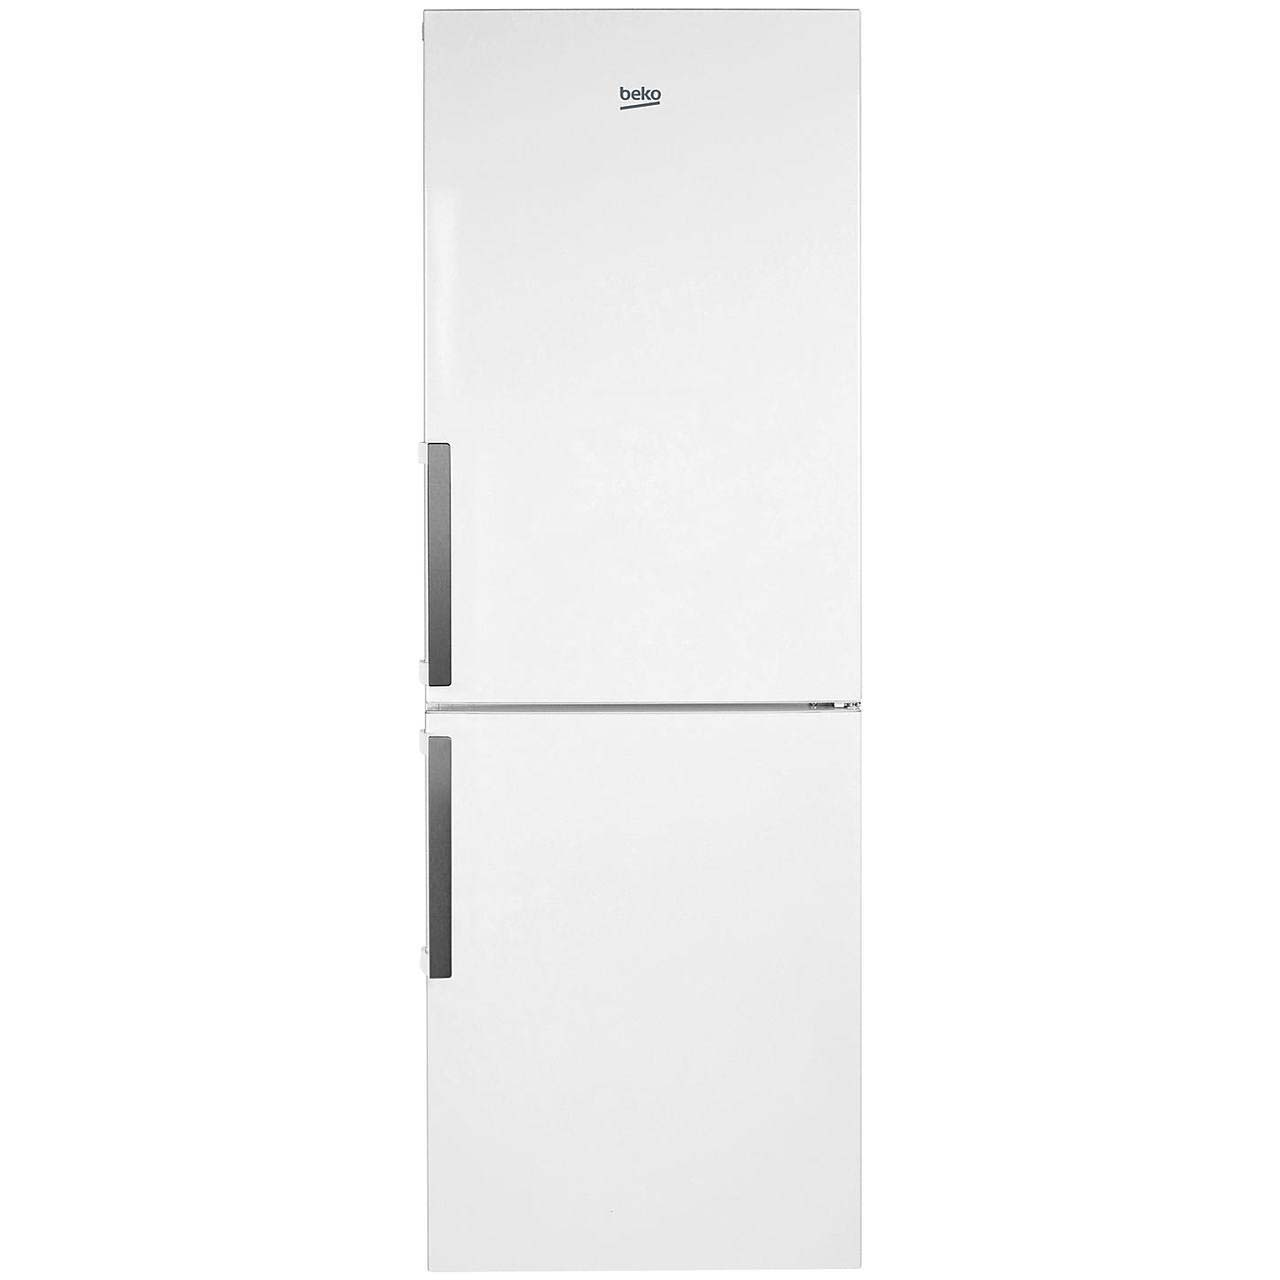 Beko Frost Free Fridge Freezer   CFP1675W